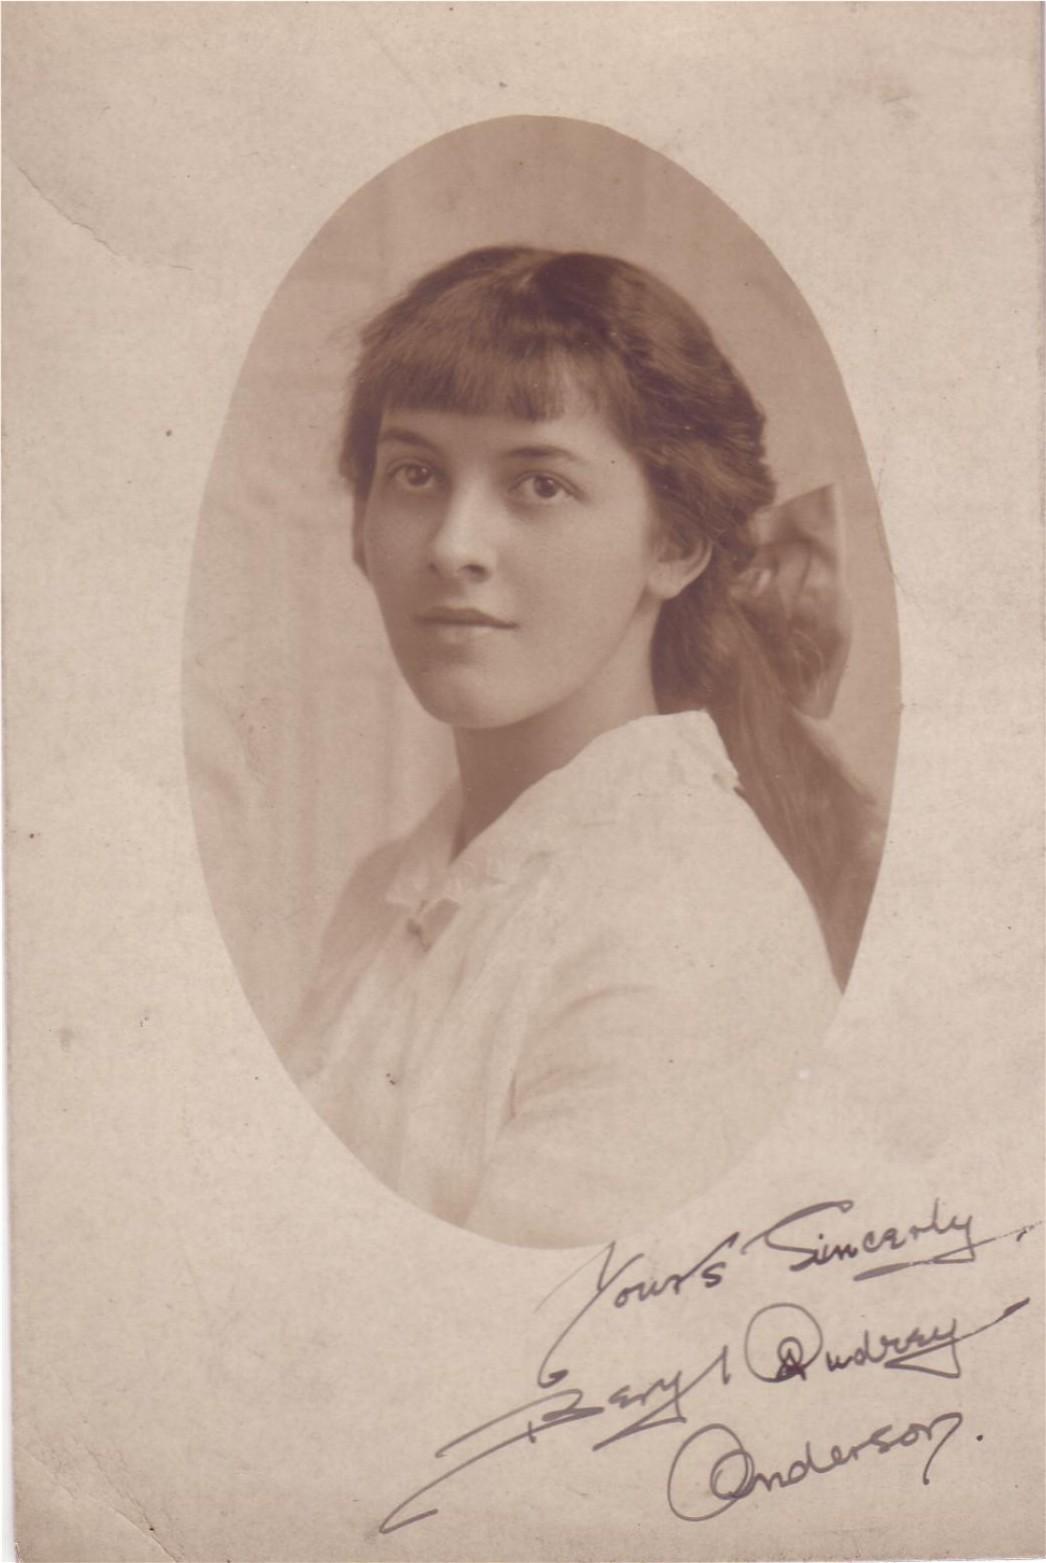 Audrey J. Anderson